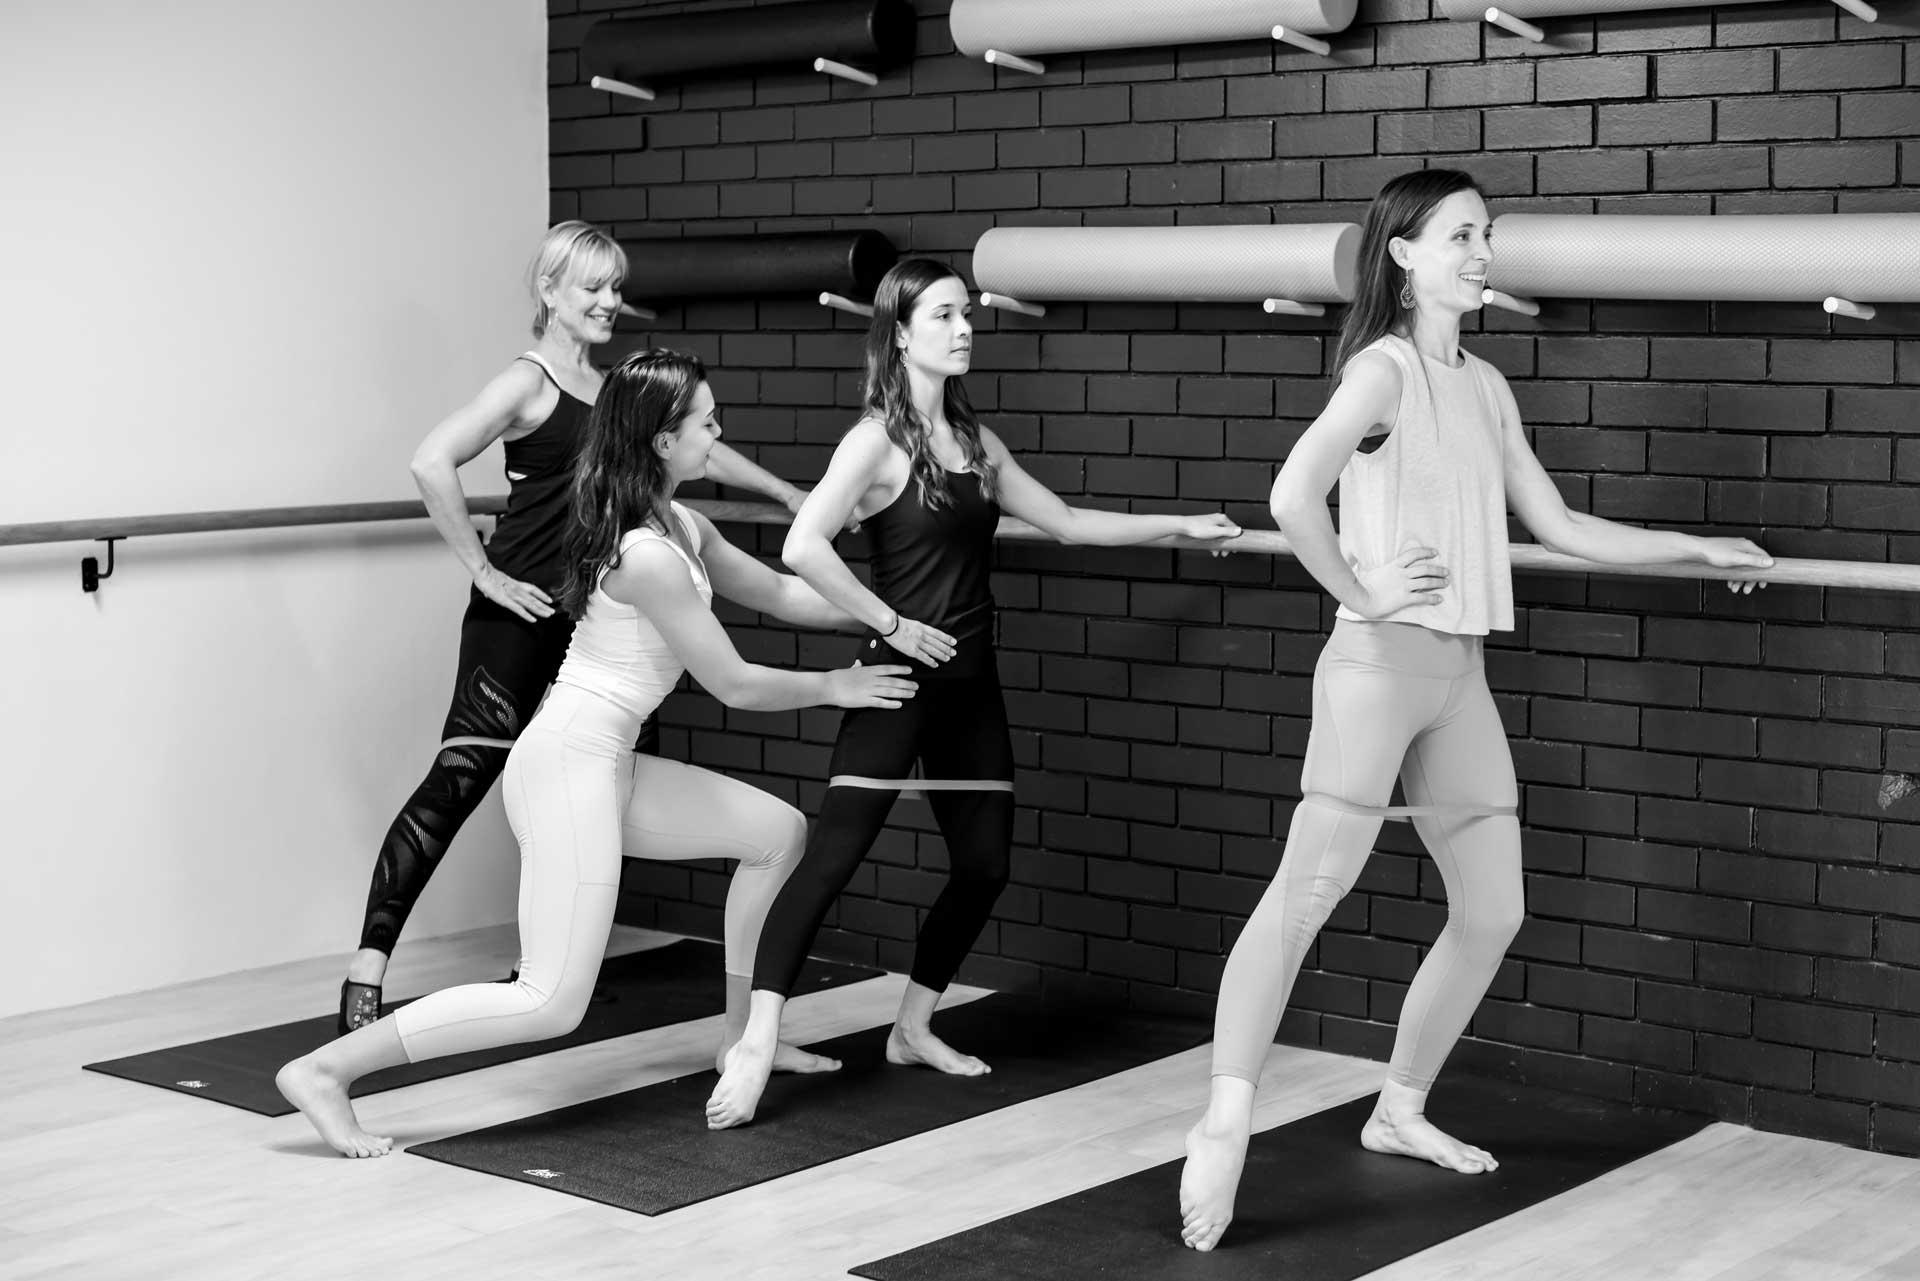 Northern Rivers Pilates Barre classes Lismore NSW Australia